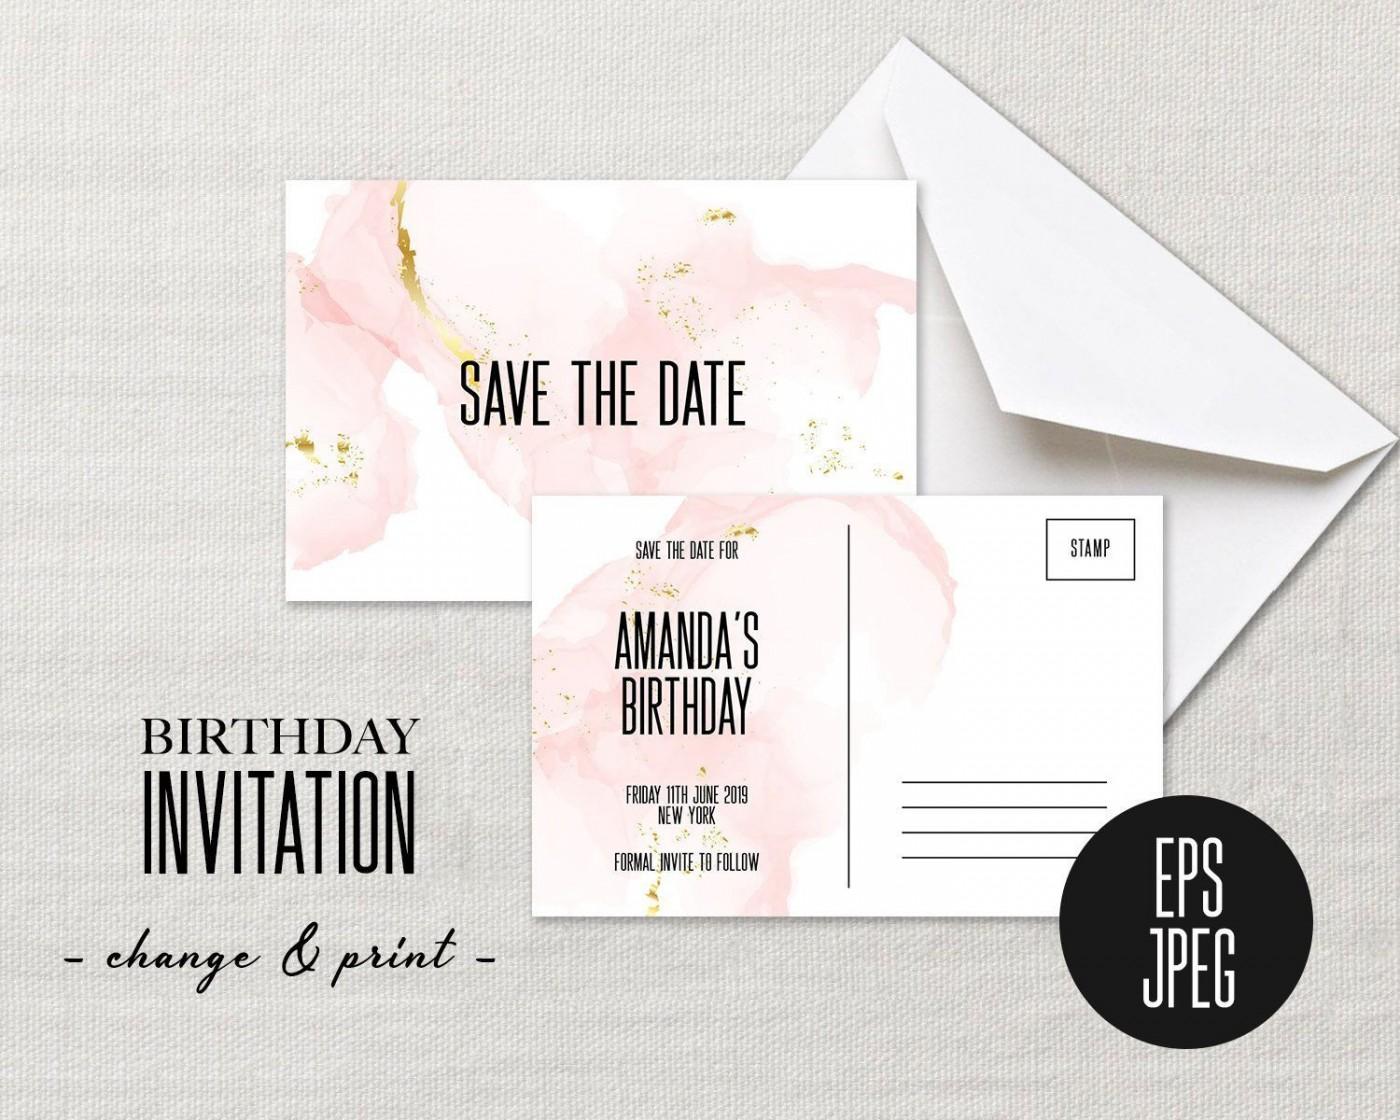 002 Striking Save The Date Birthday Card Template Image  Free Printable1400